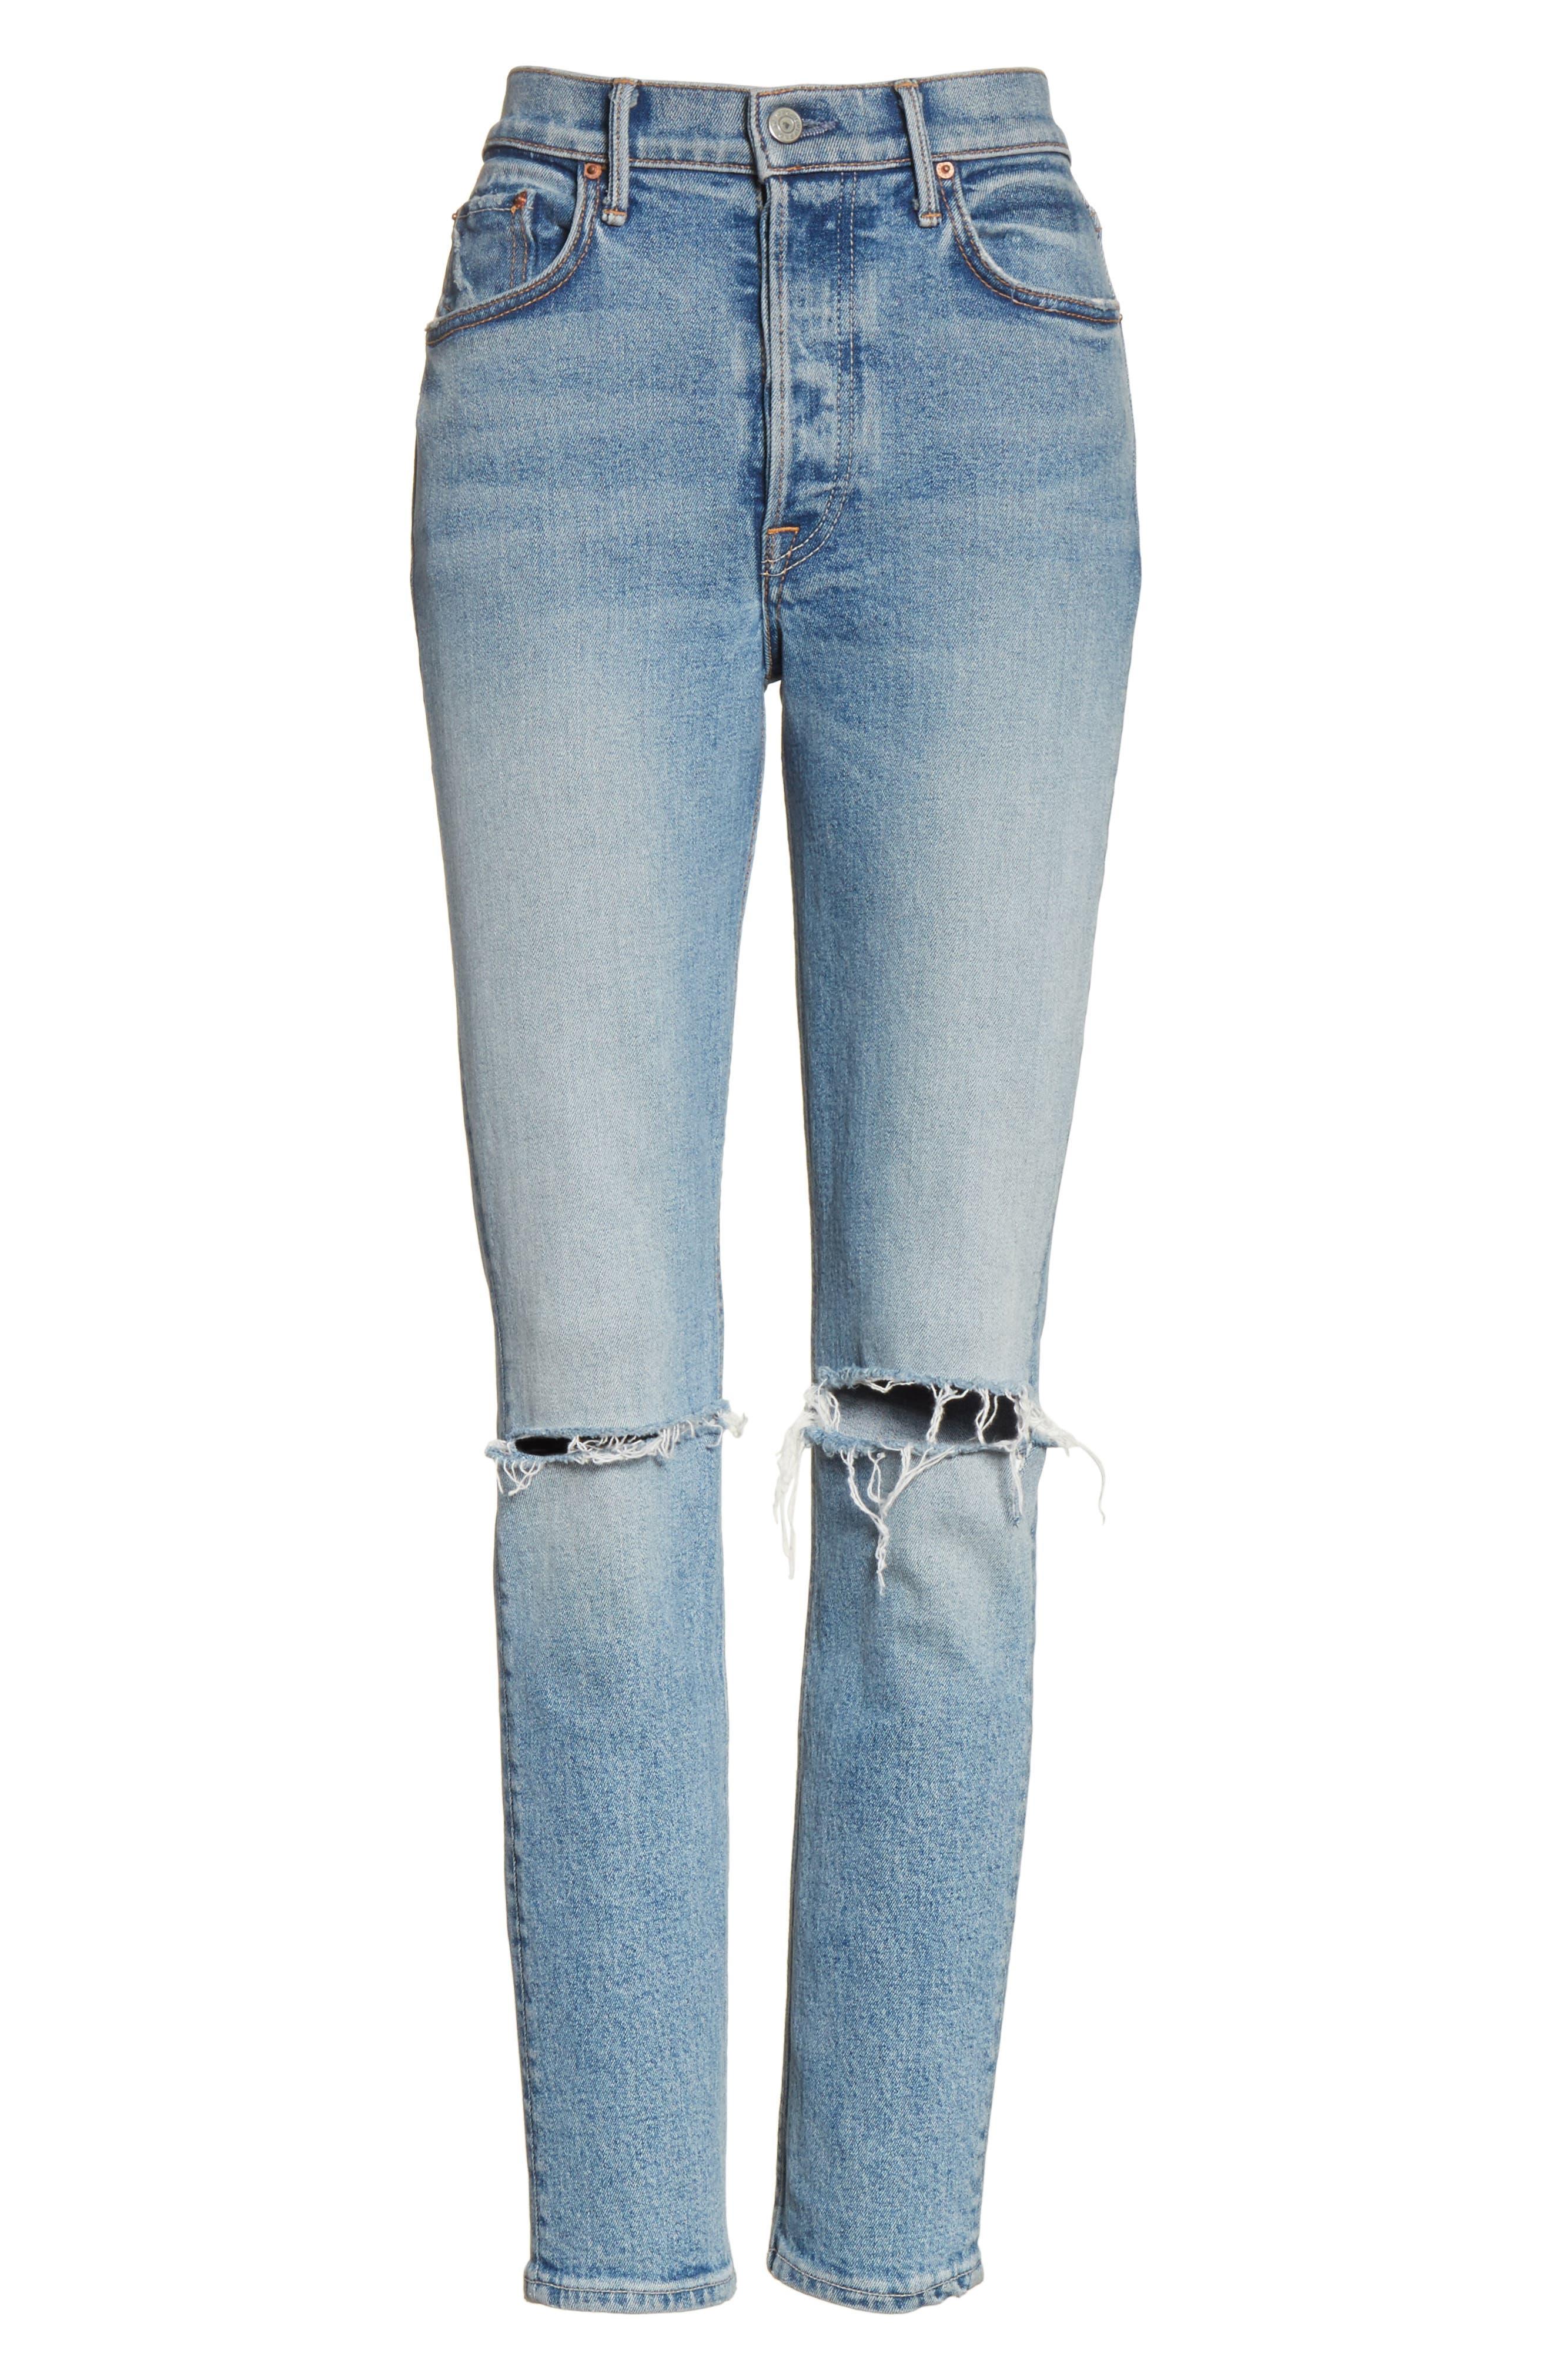 Karolina High Waist Jeans,                             Alternate thumbnail 6, color,                             WHAT IS LIFE